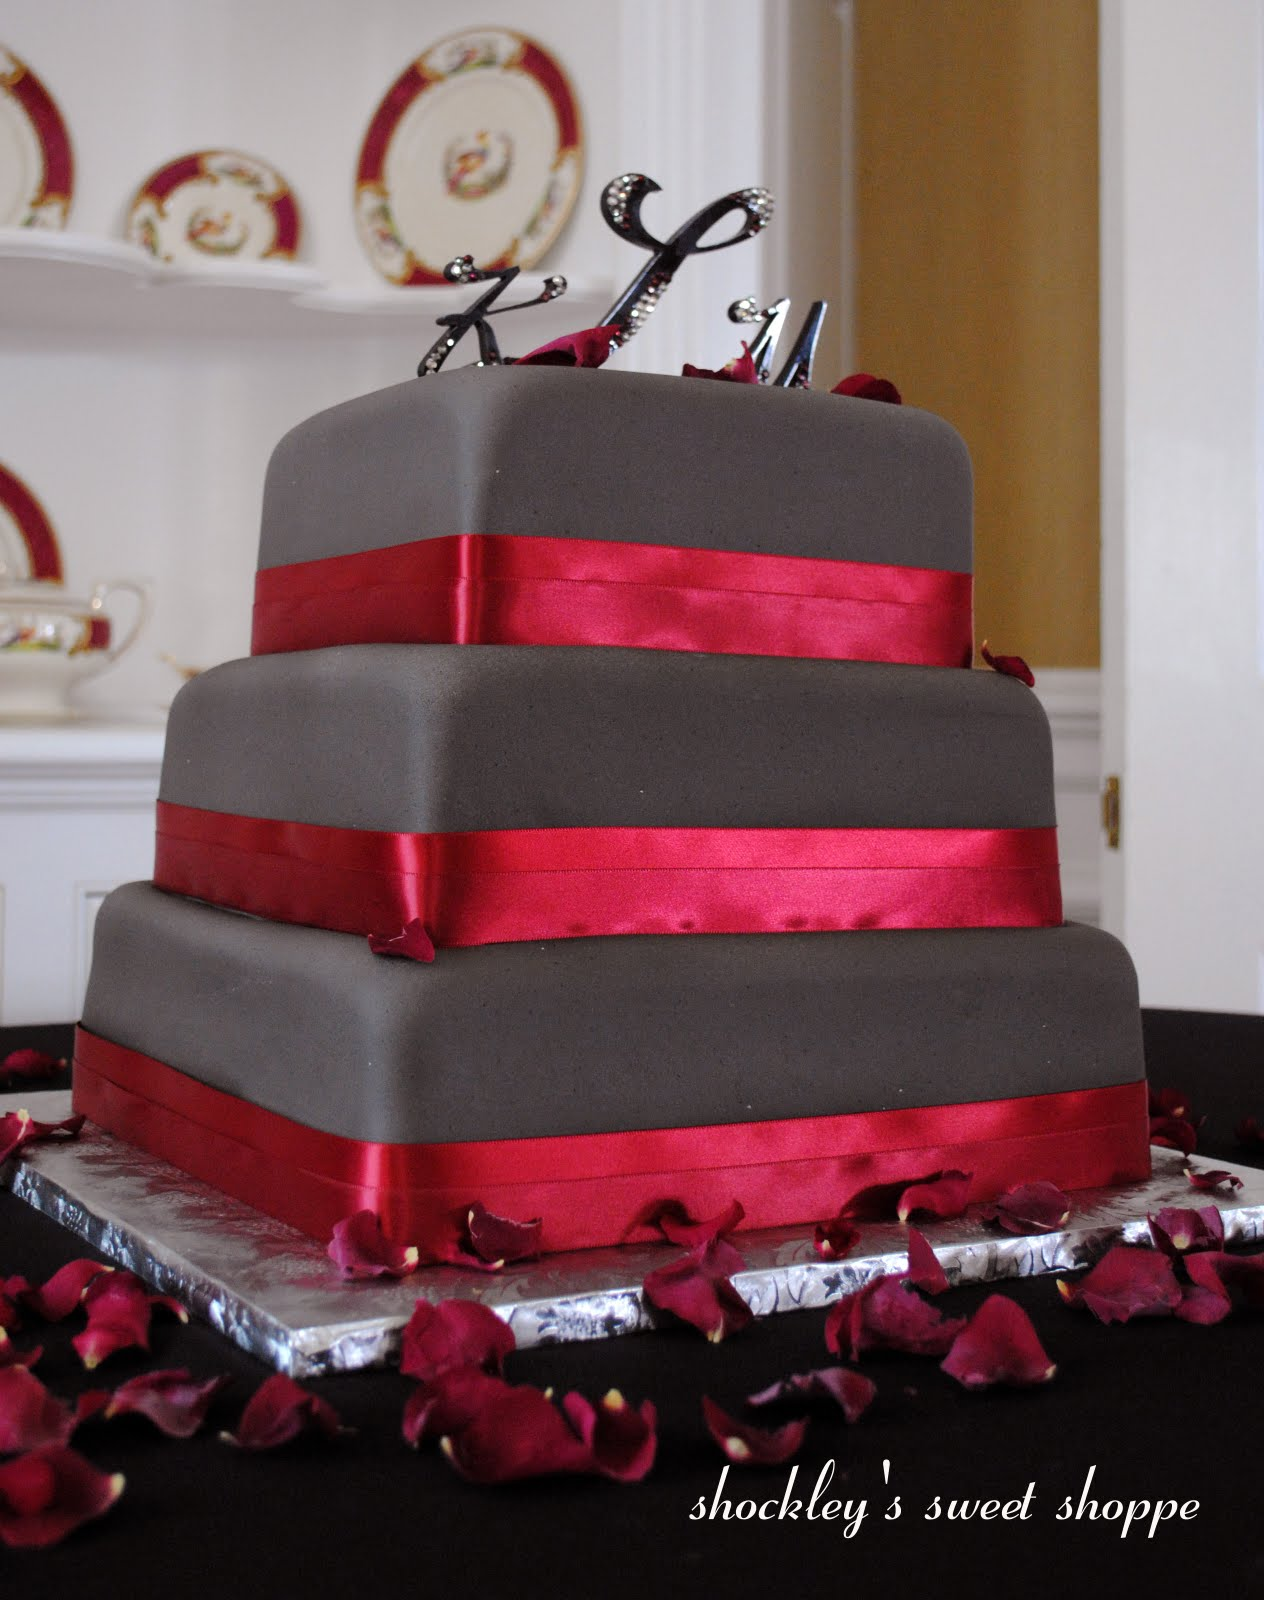 8-10-12 wedding cake